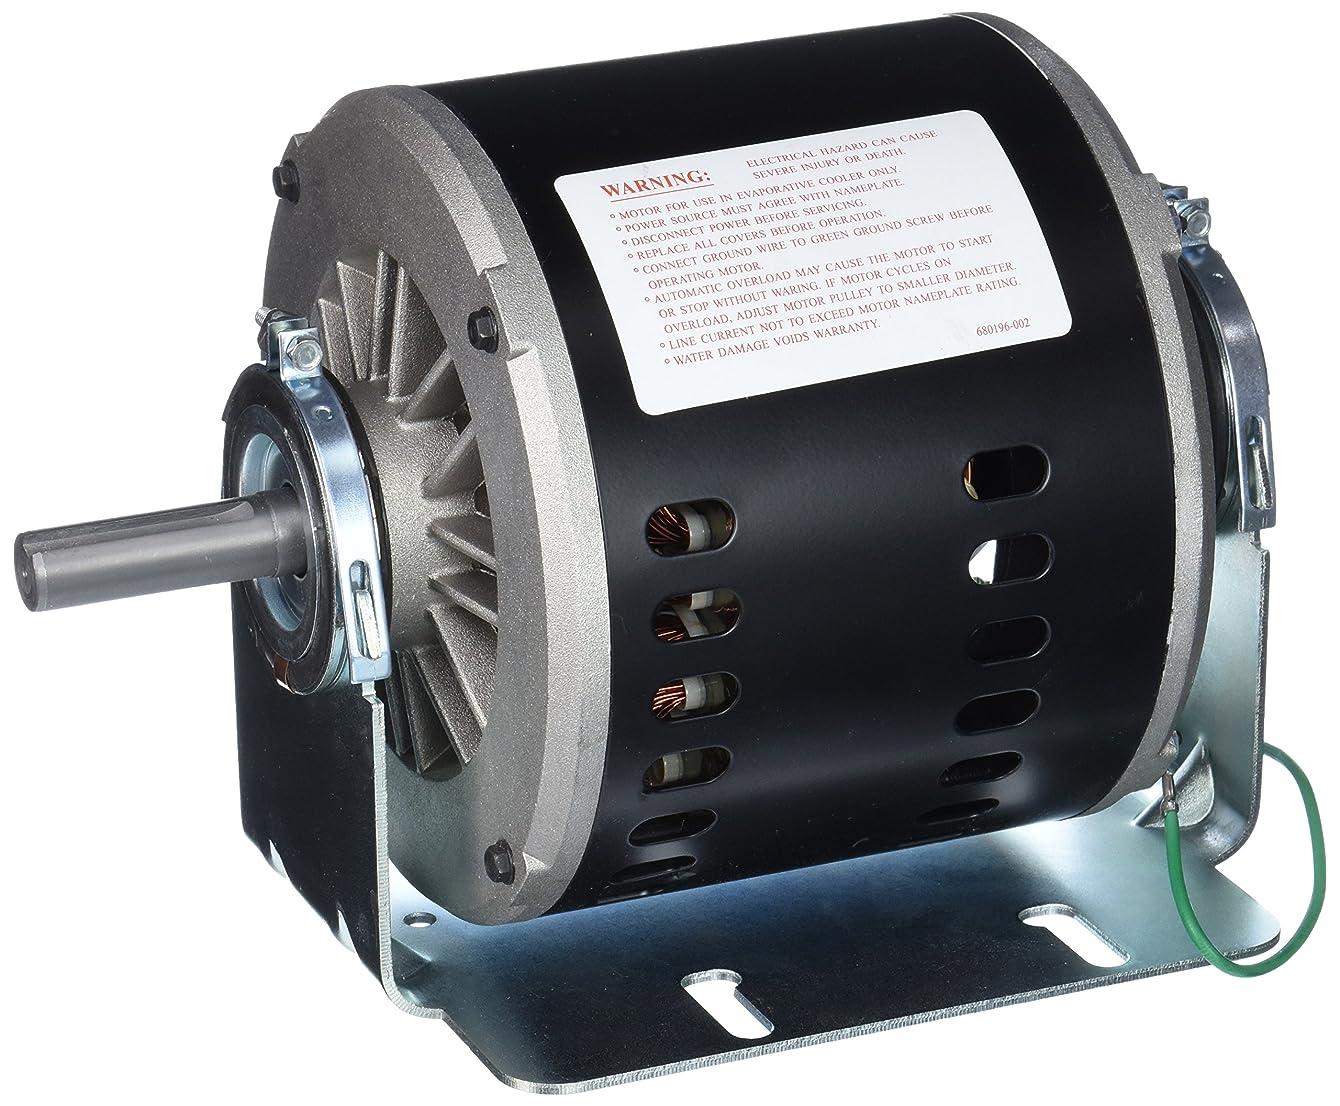 AO Smith VB2074B  6-1/2-Inch Frame Diameter 3/4 HP 1725 RPM 115-Volt 10.6-Amp Sleeve Bearing Evaporative Cooler